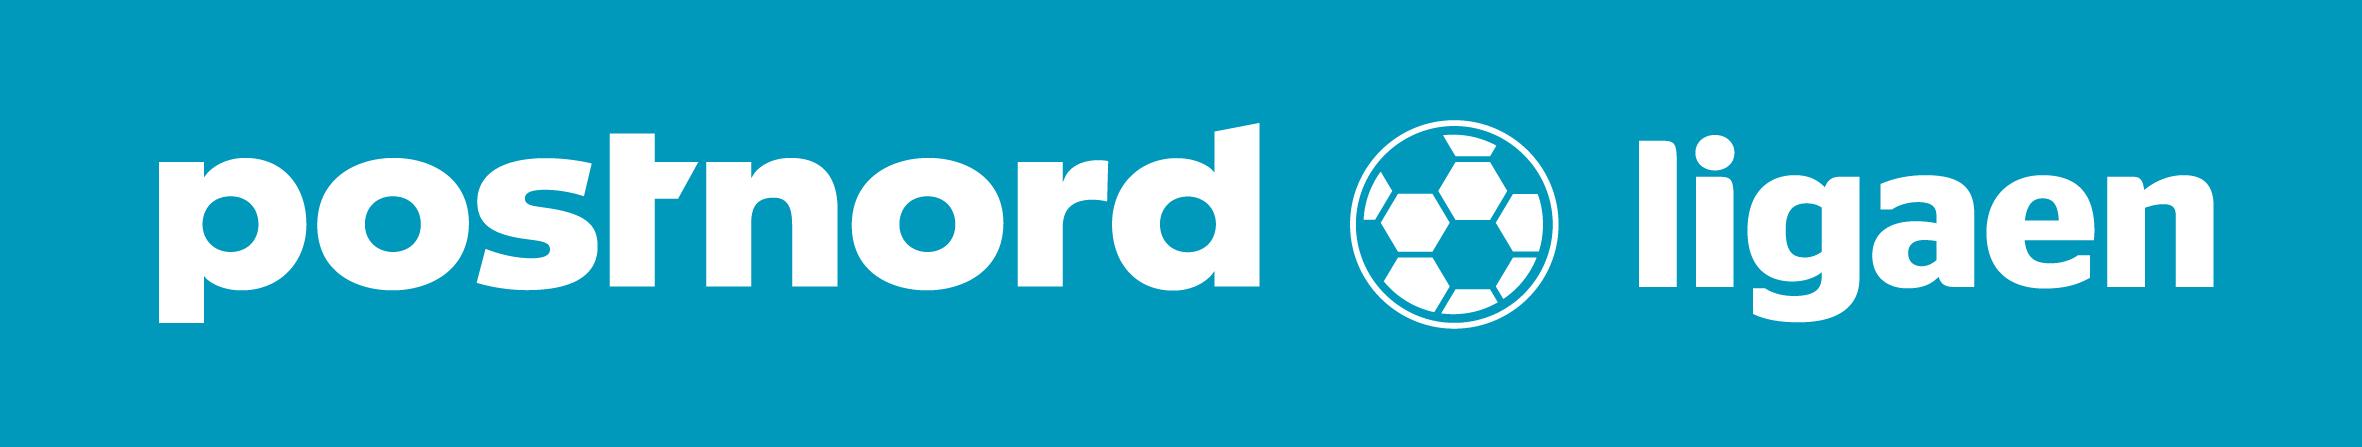 http://www.fotballnerd.no/wp-content/uploads/2016/06/postnord_ligaen_logo_png-1.png